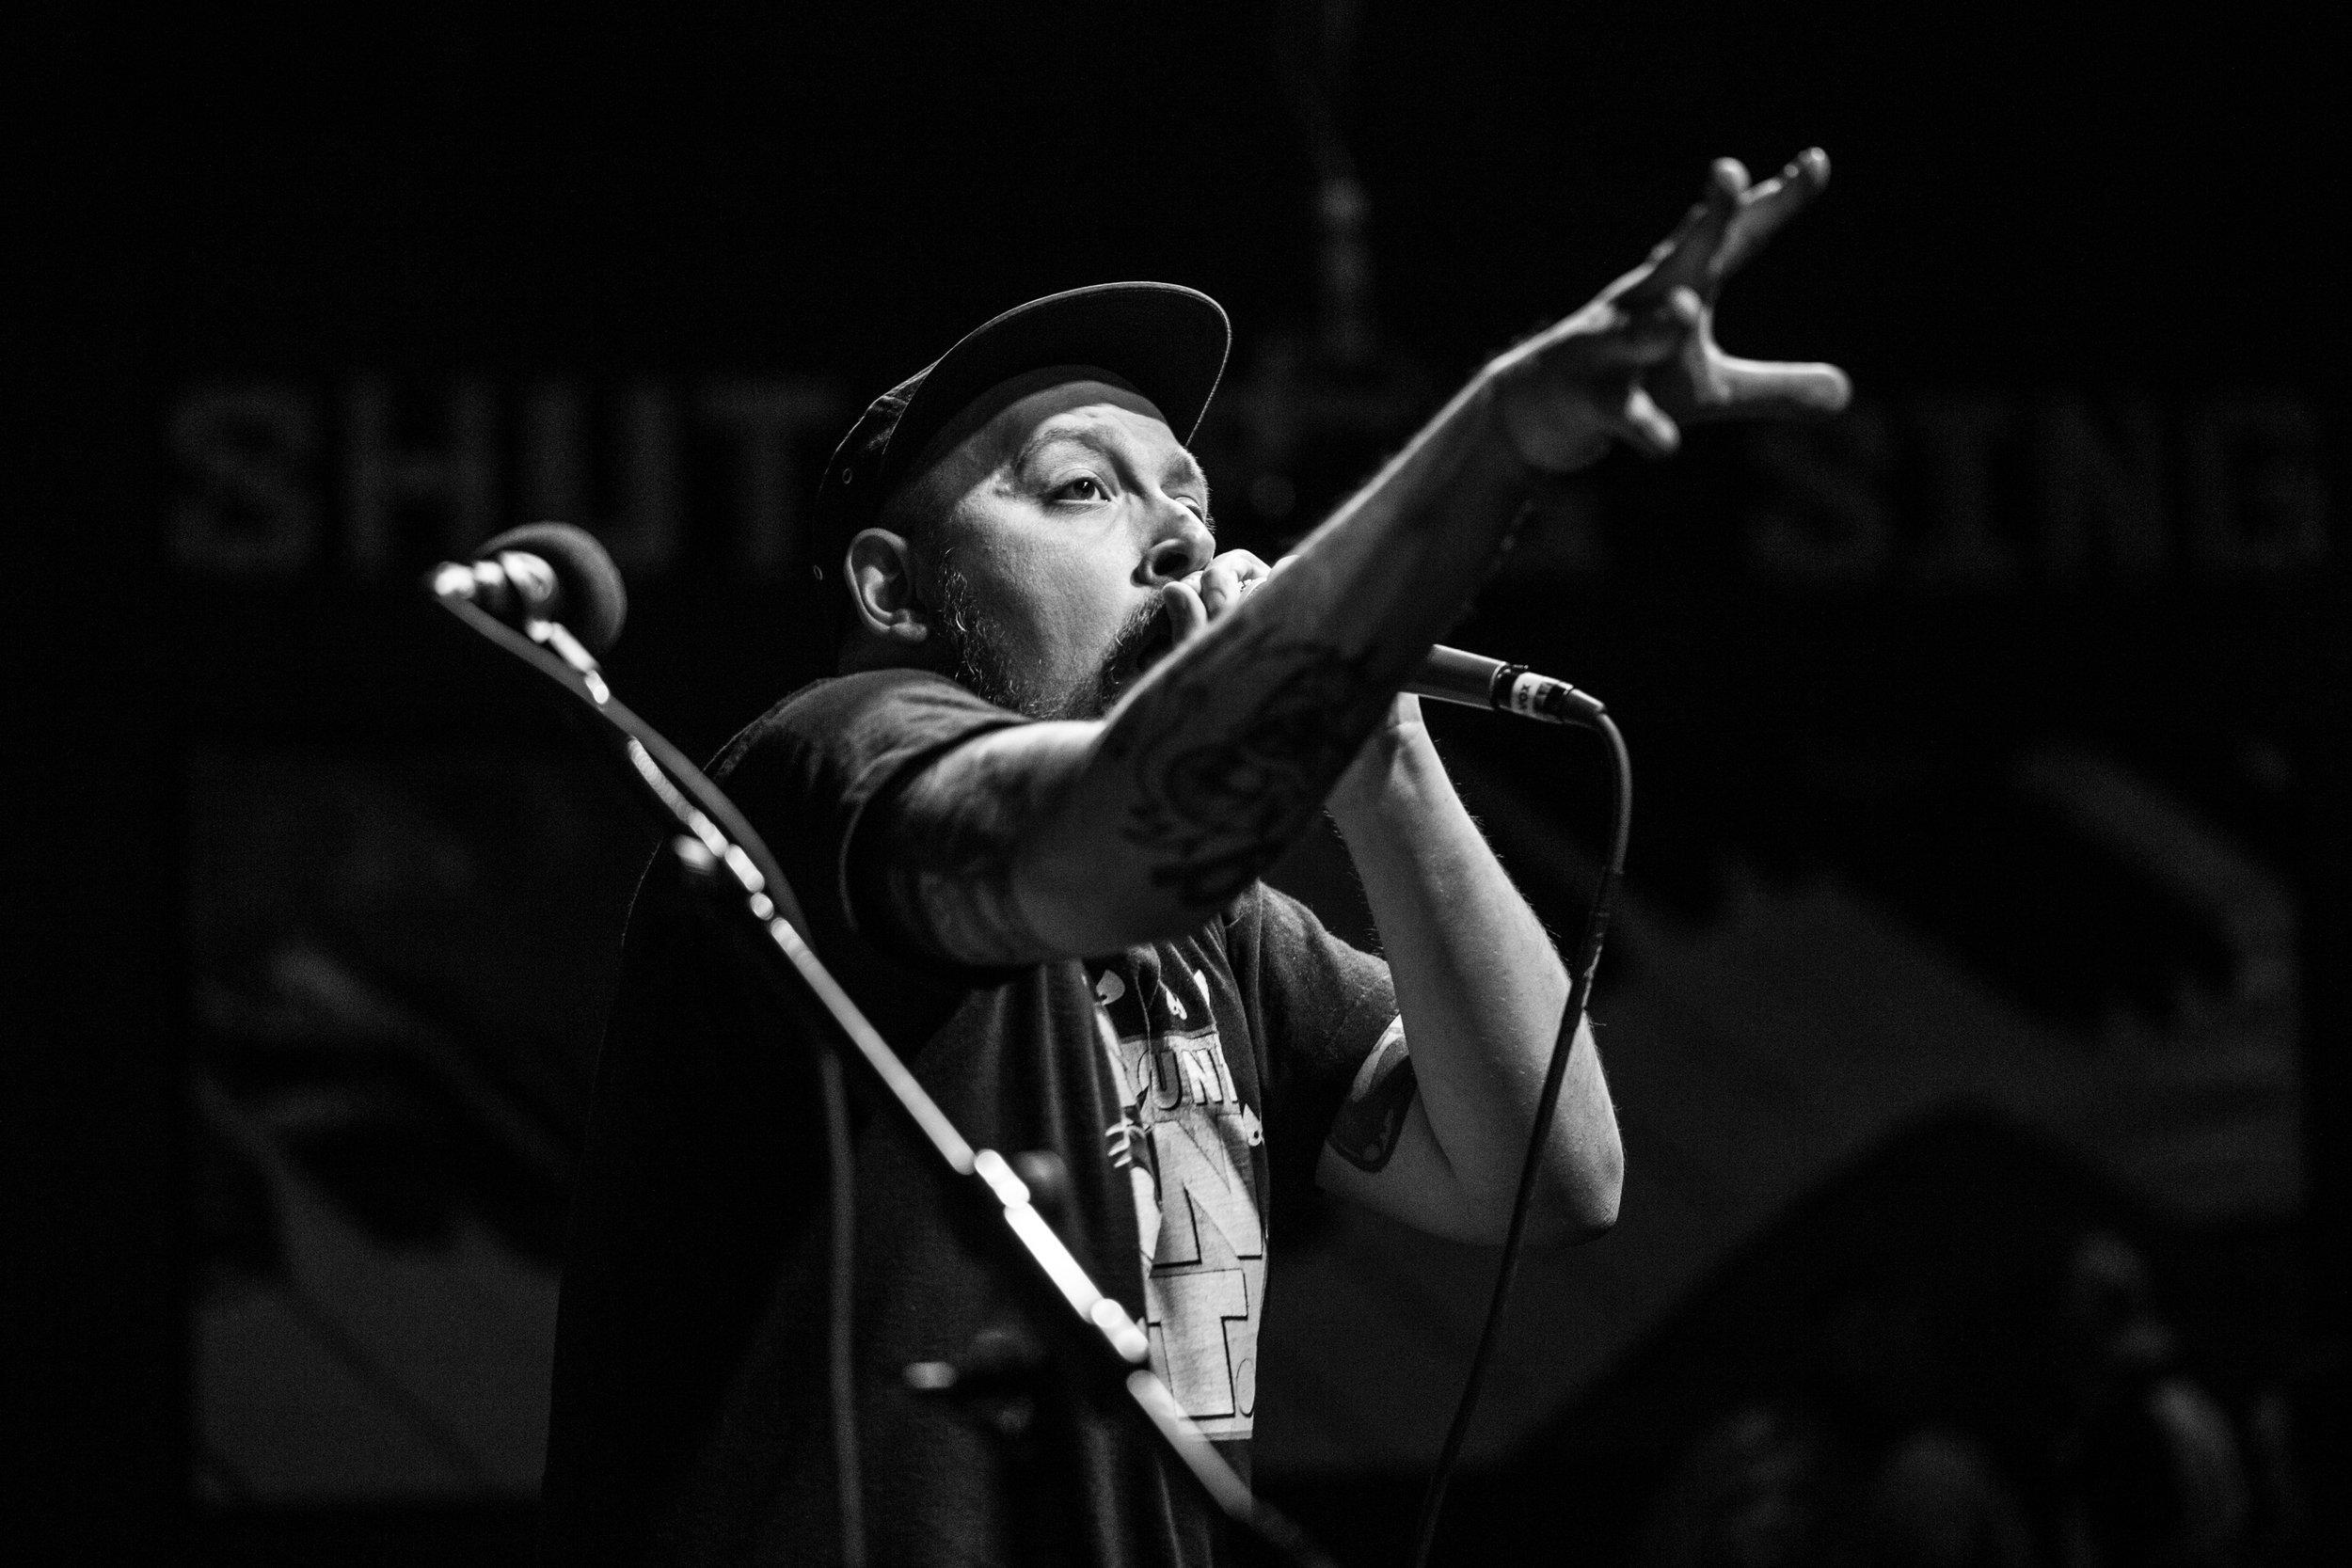 Photo: Buzzy Torek / Epicast